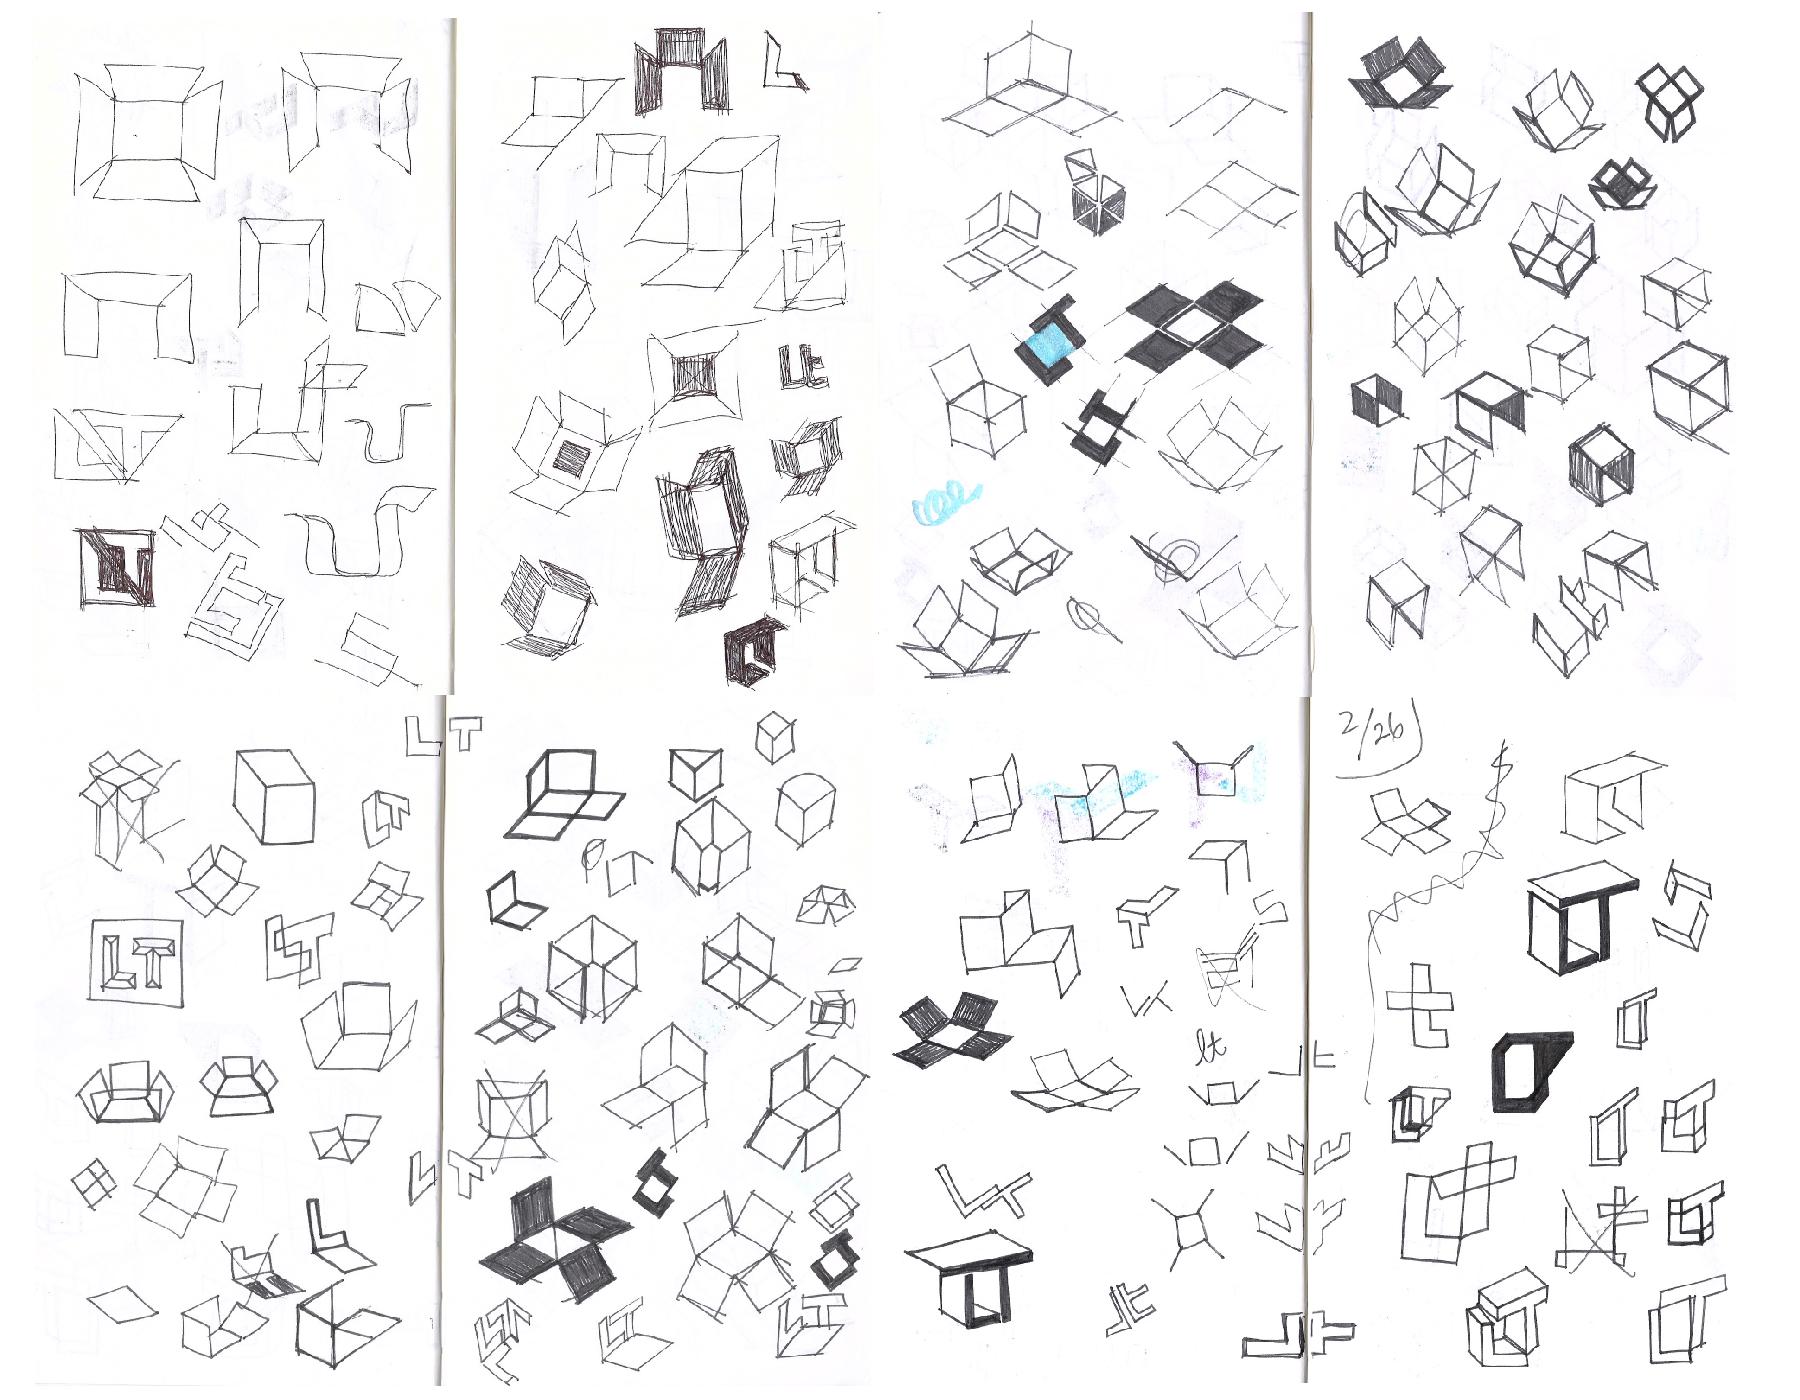 logo_sketches-03.jpg